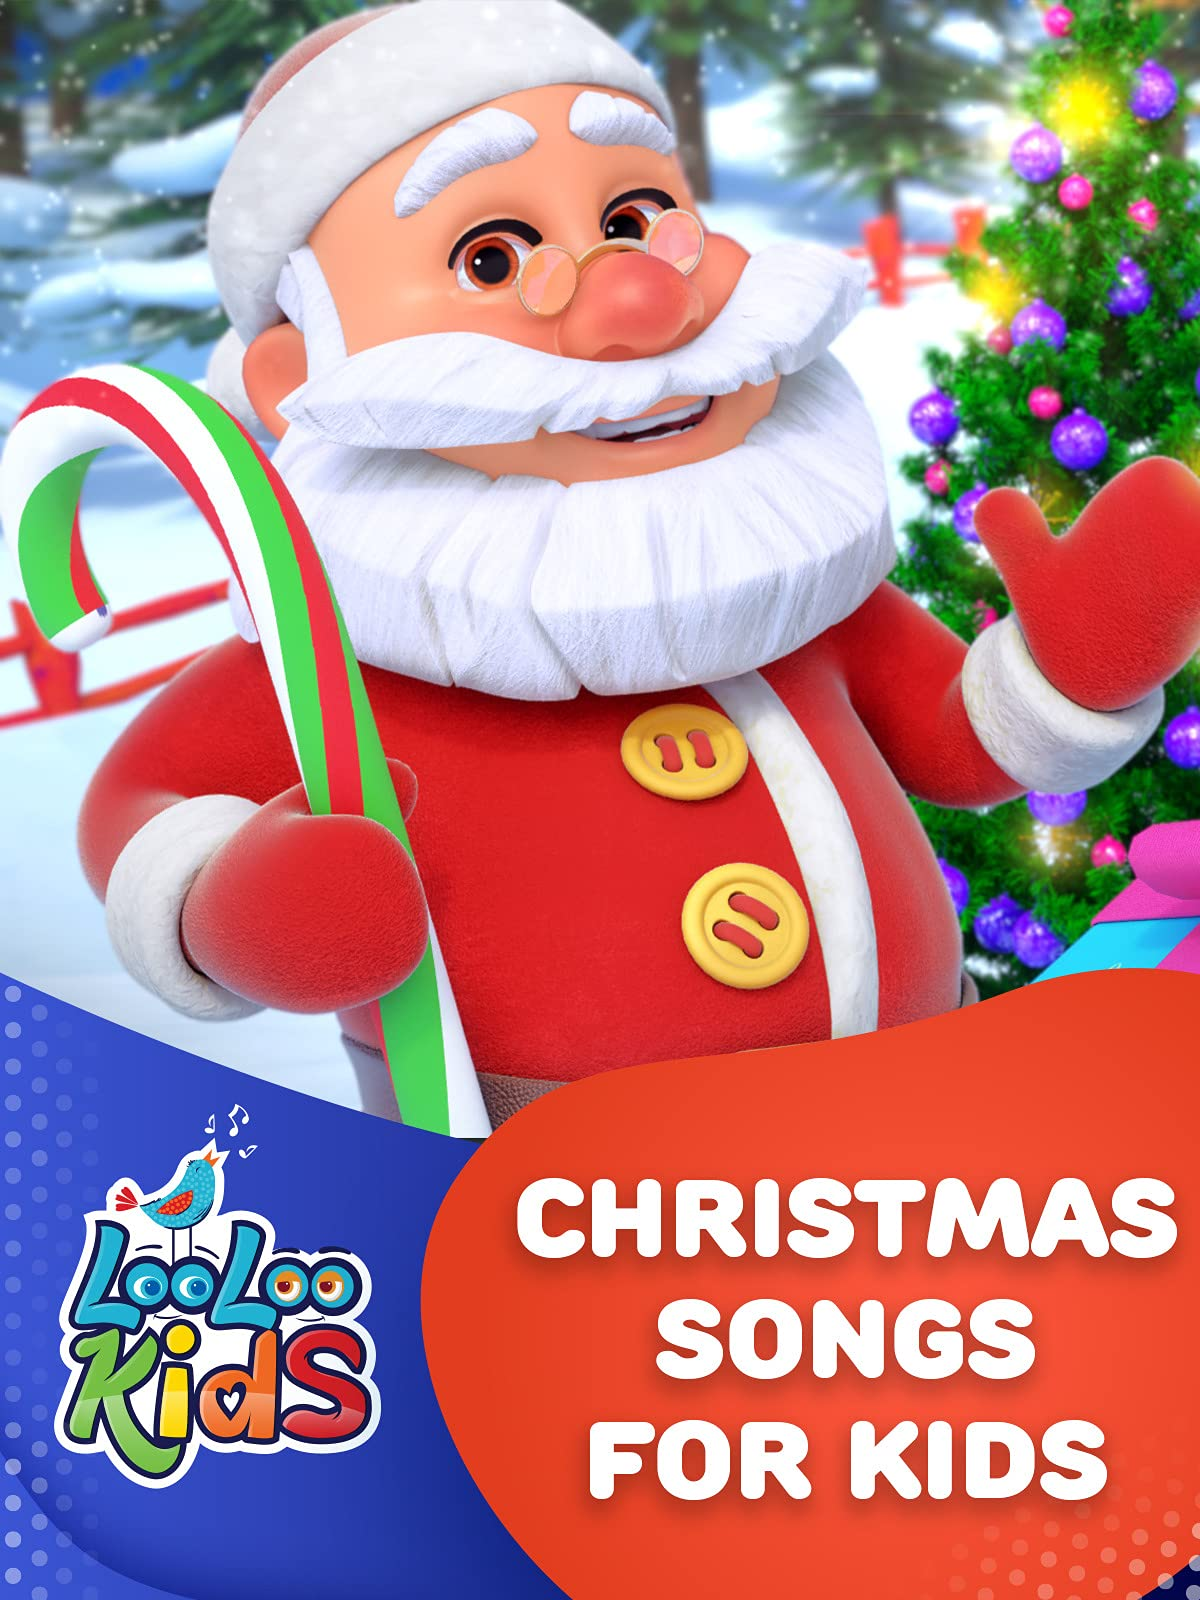 Christmas Songs for Kids - LooLoo Kids on Amazon Prime Video UK